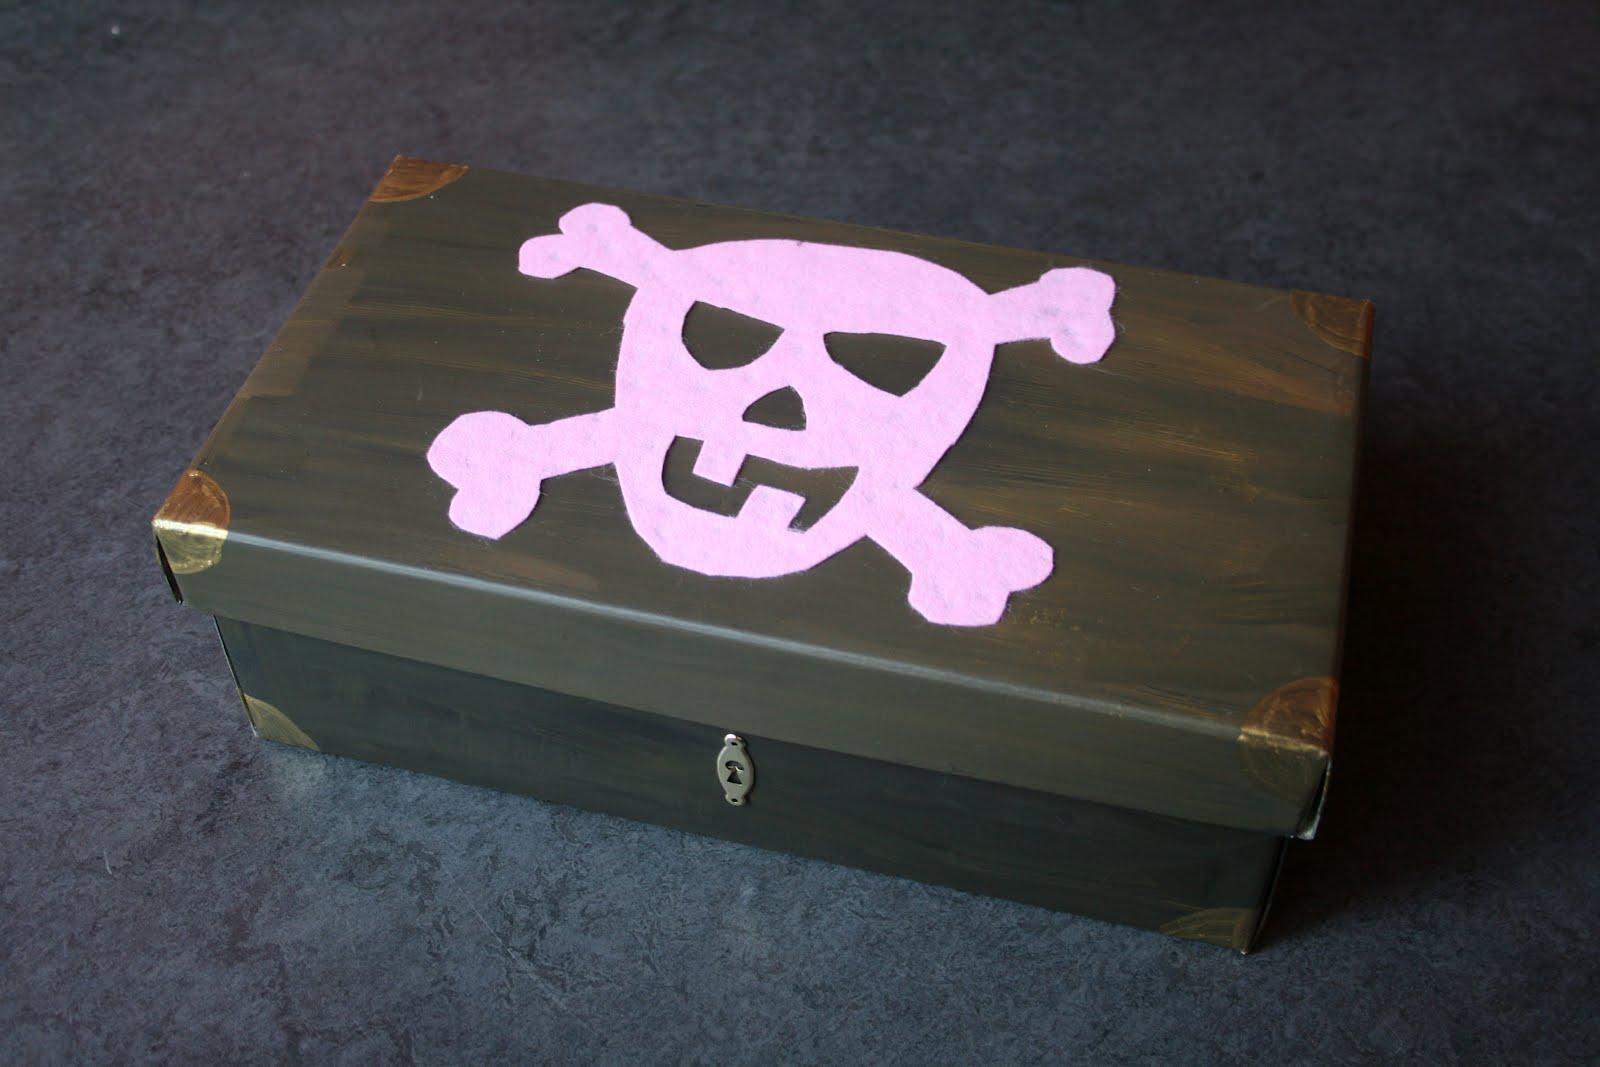 lavendel 39 s blog piratenparty schatzkisten. Black Bedroom Furniture Sets. Home Design Ideas